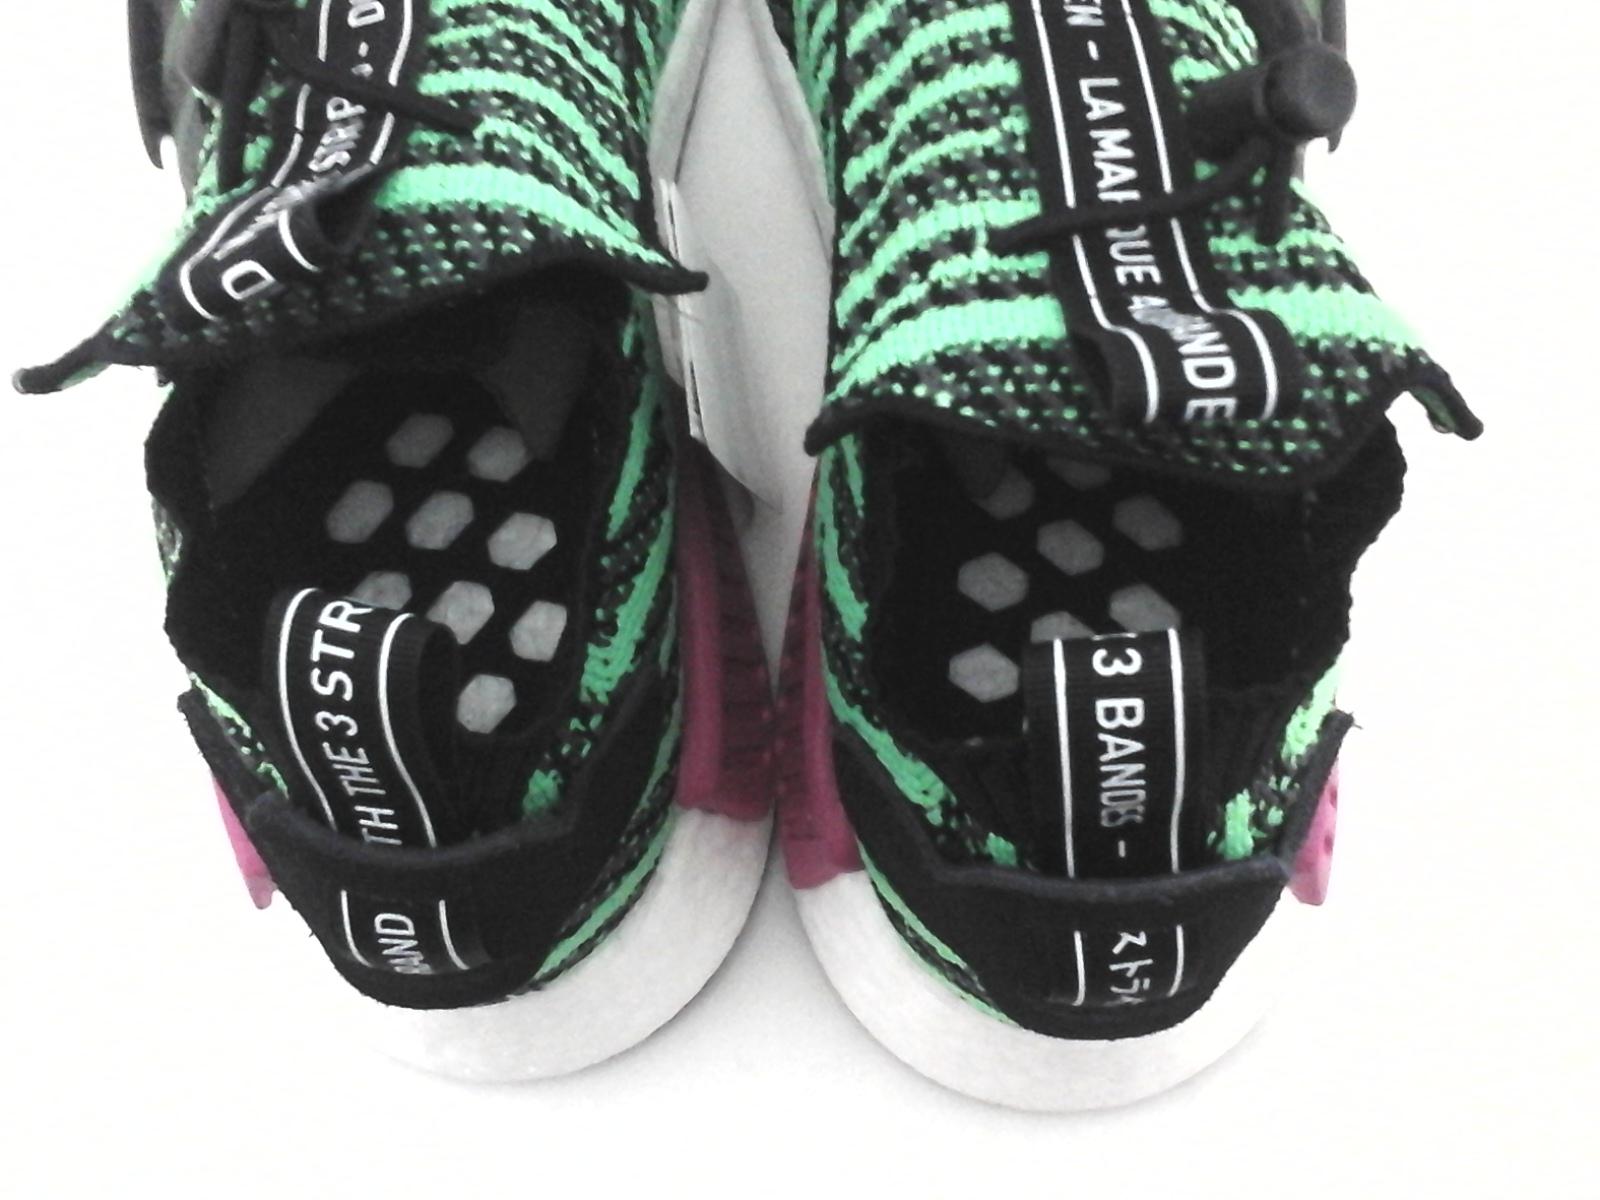 526eefcbe6d08 ADIDAS NMD Boost Running Shoes Green PK Knit Slip On B37628 Mens US 8 EU 41  1 3